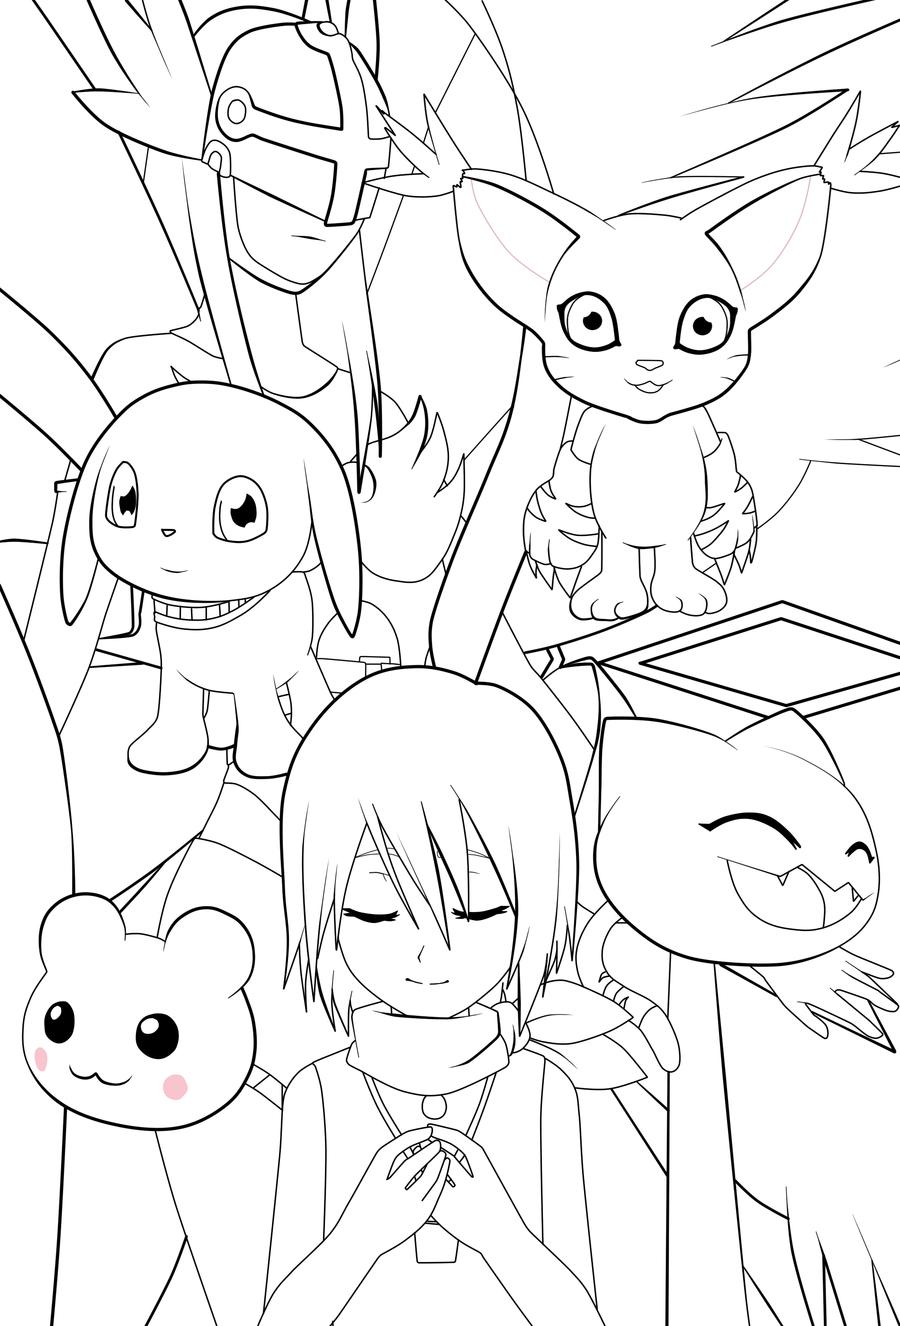 Digimon-Kari Lineart by kleenesoph